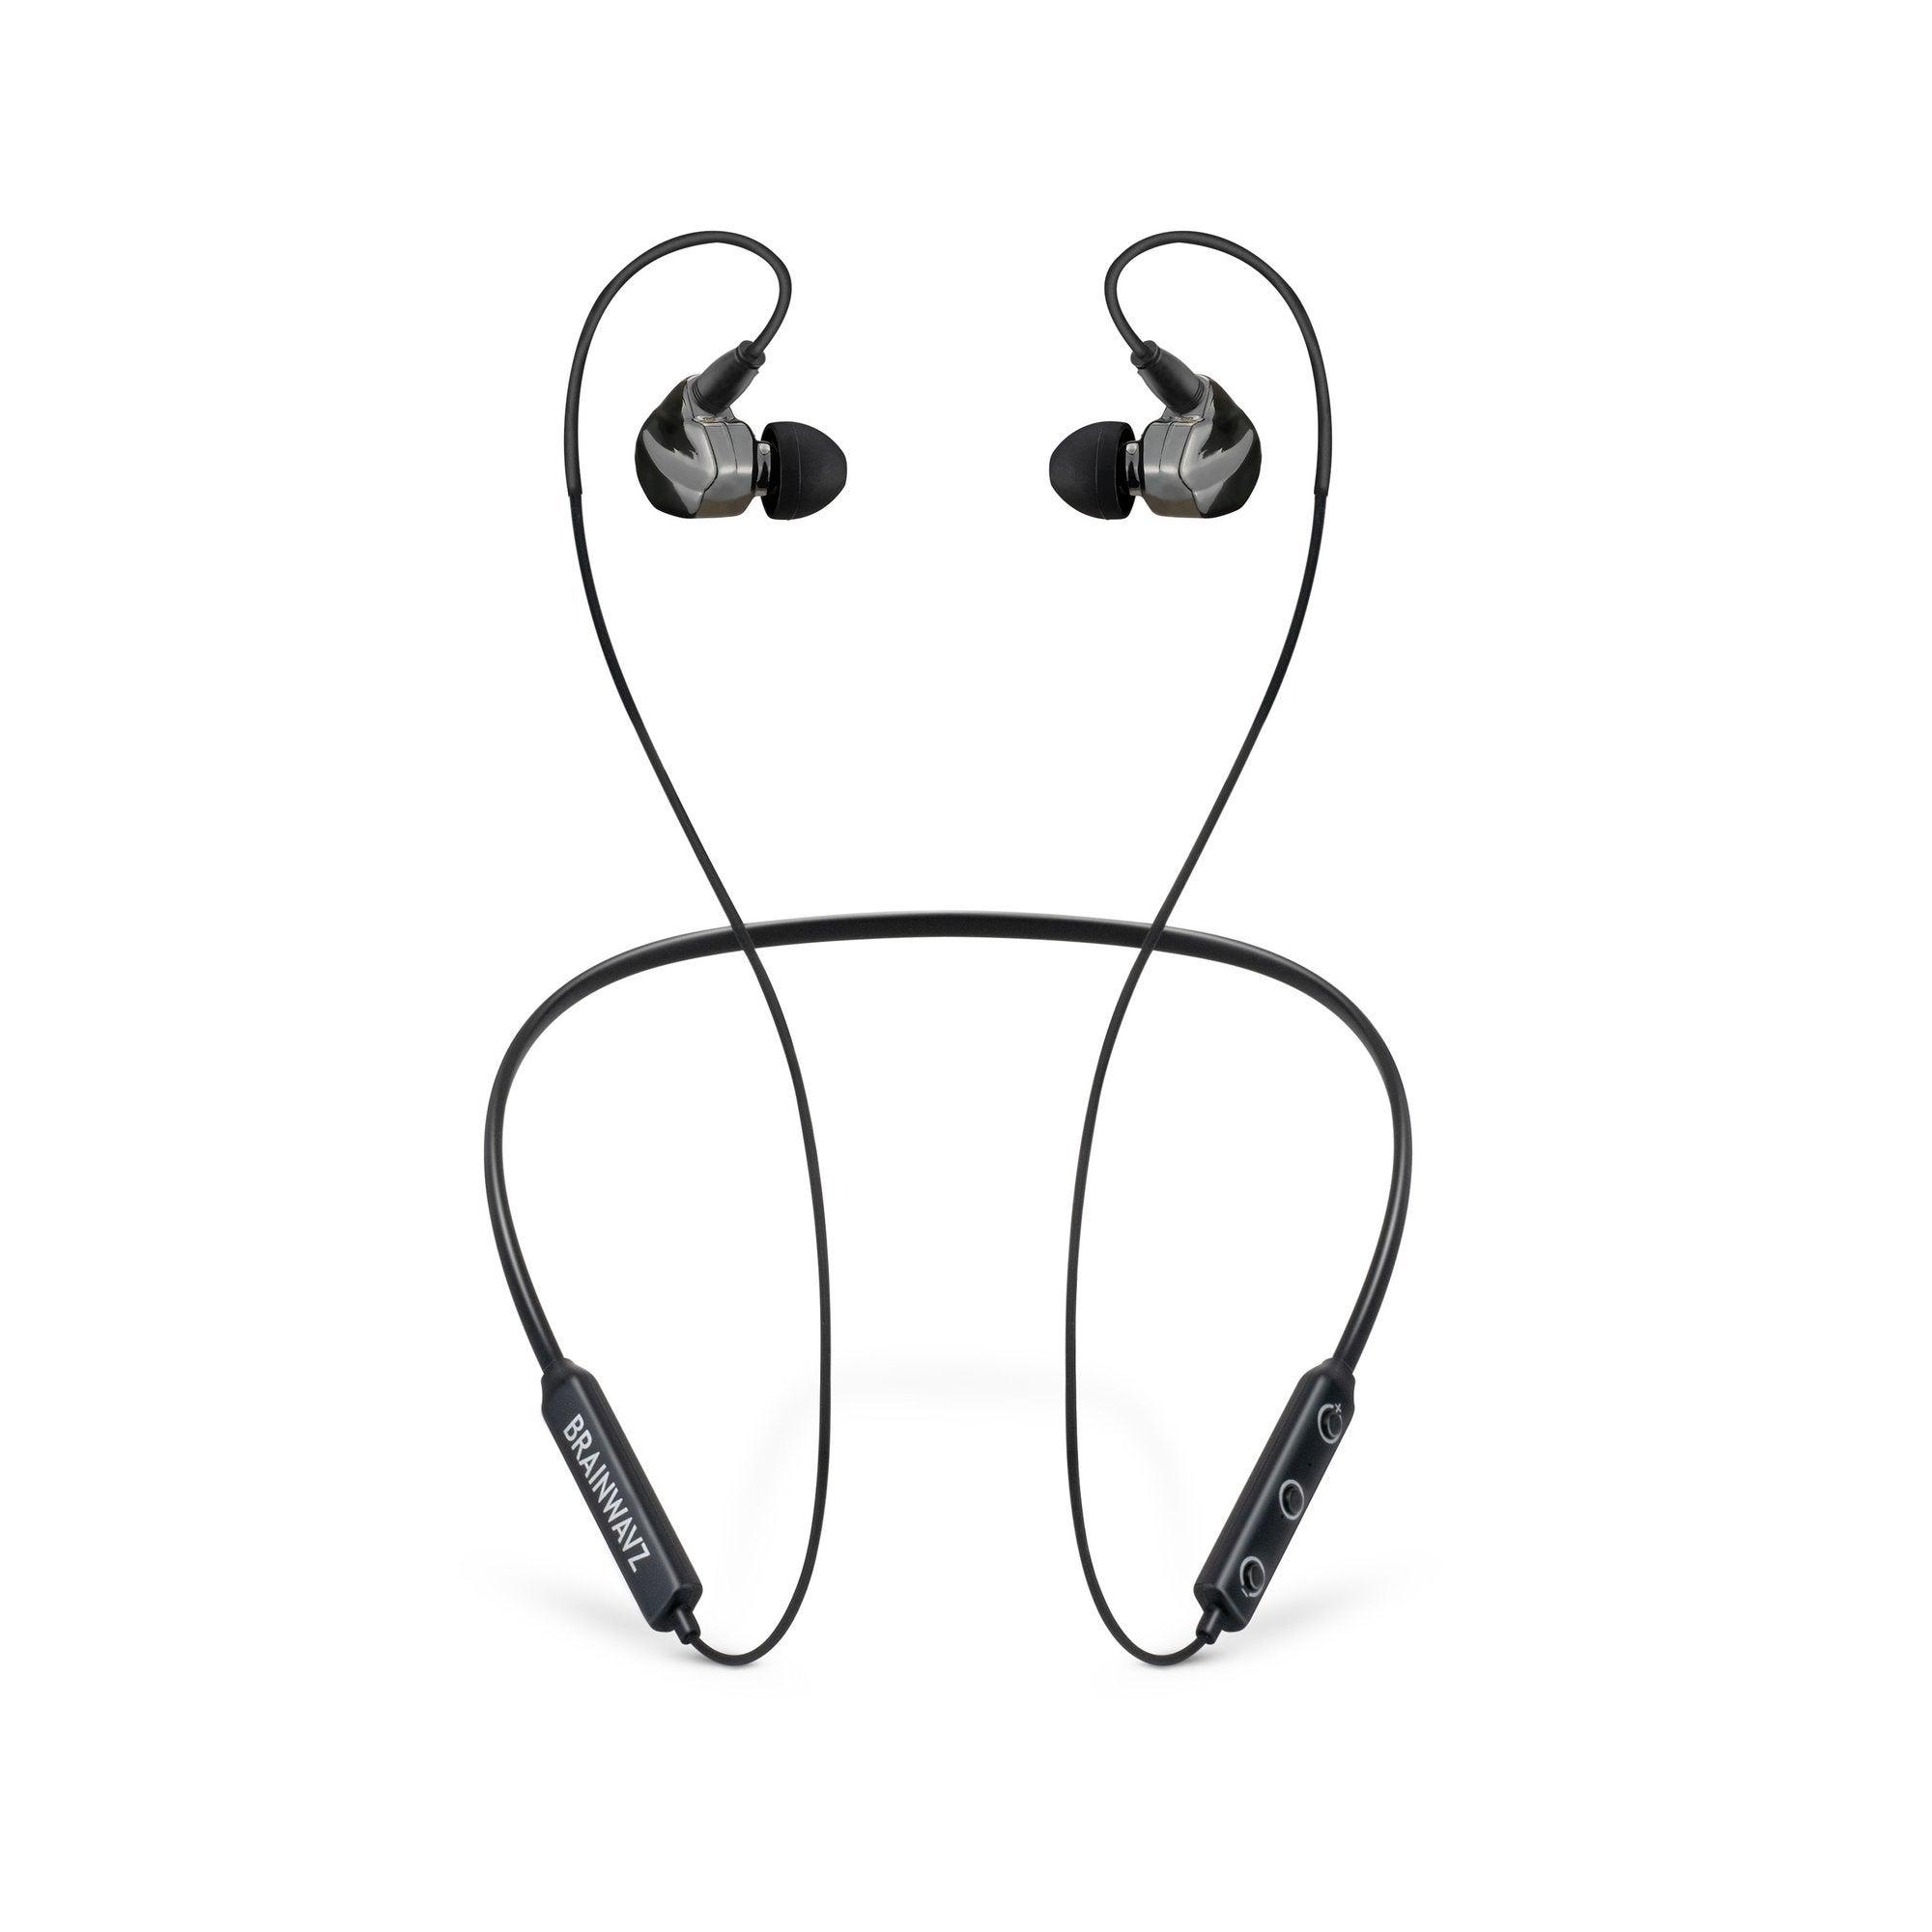 Brainwavz DDM100 Headphones